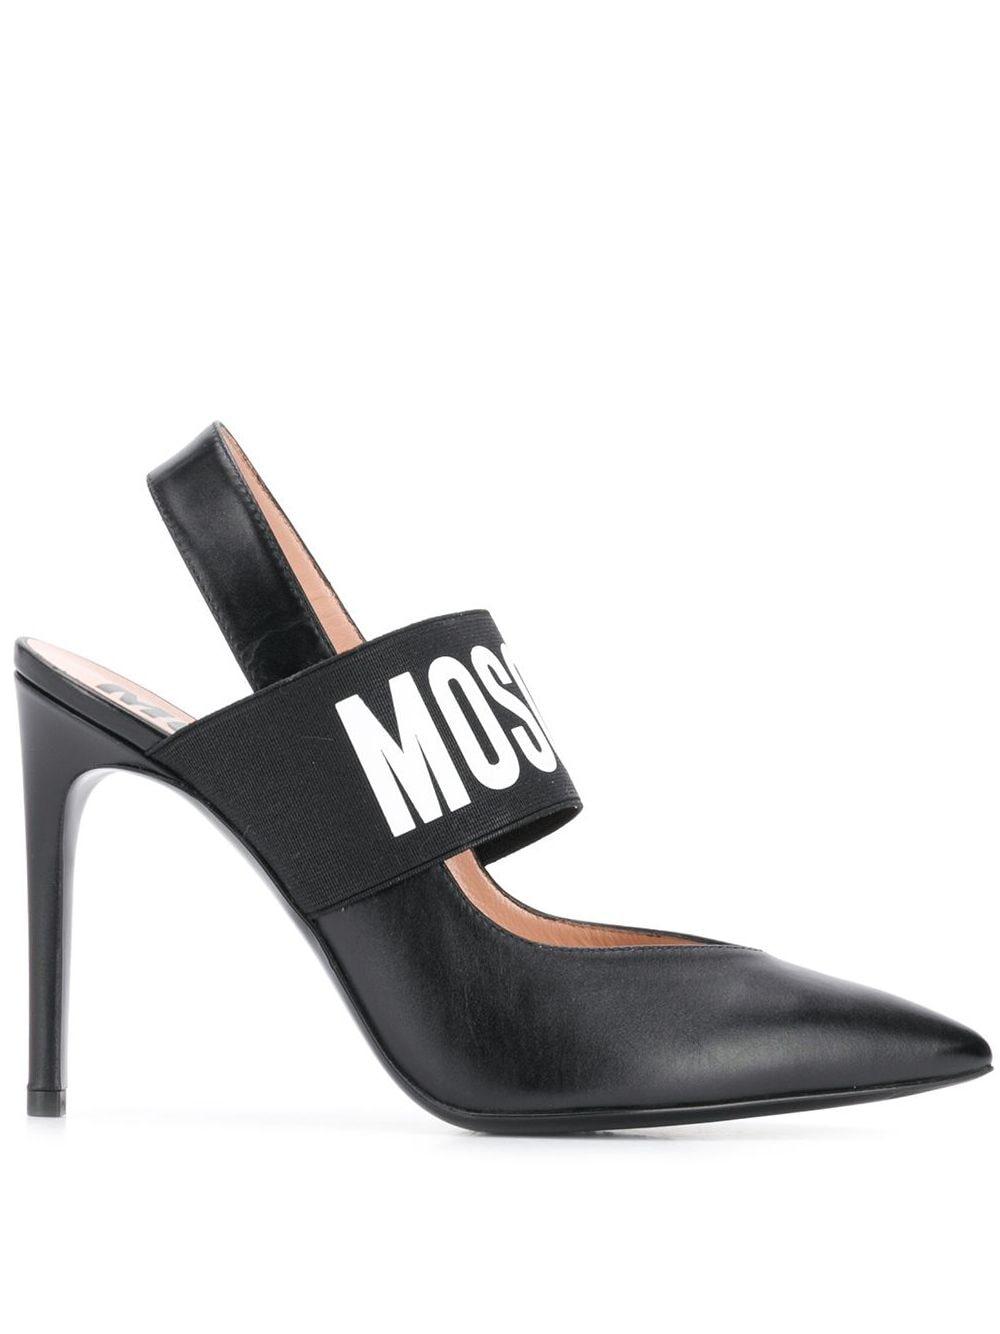 Moschino Slingback-Pumps mit Logo - Schwarz